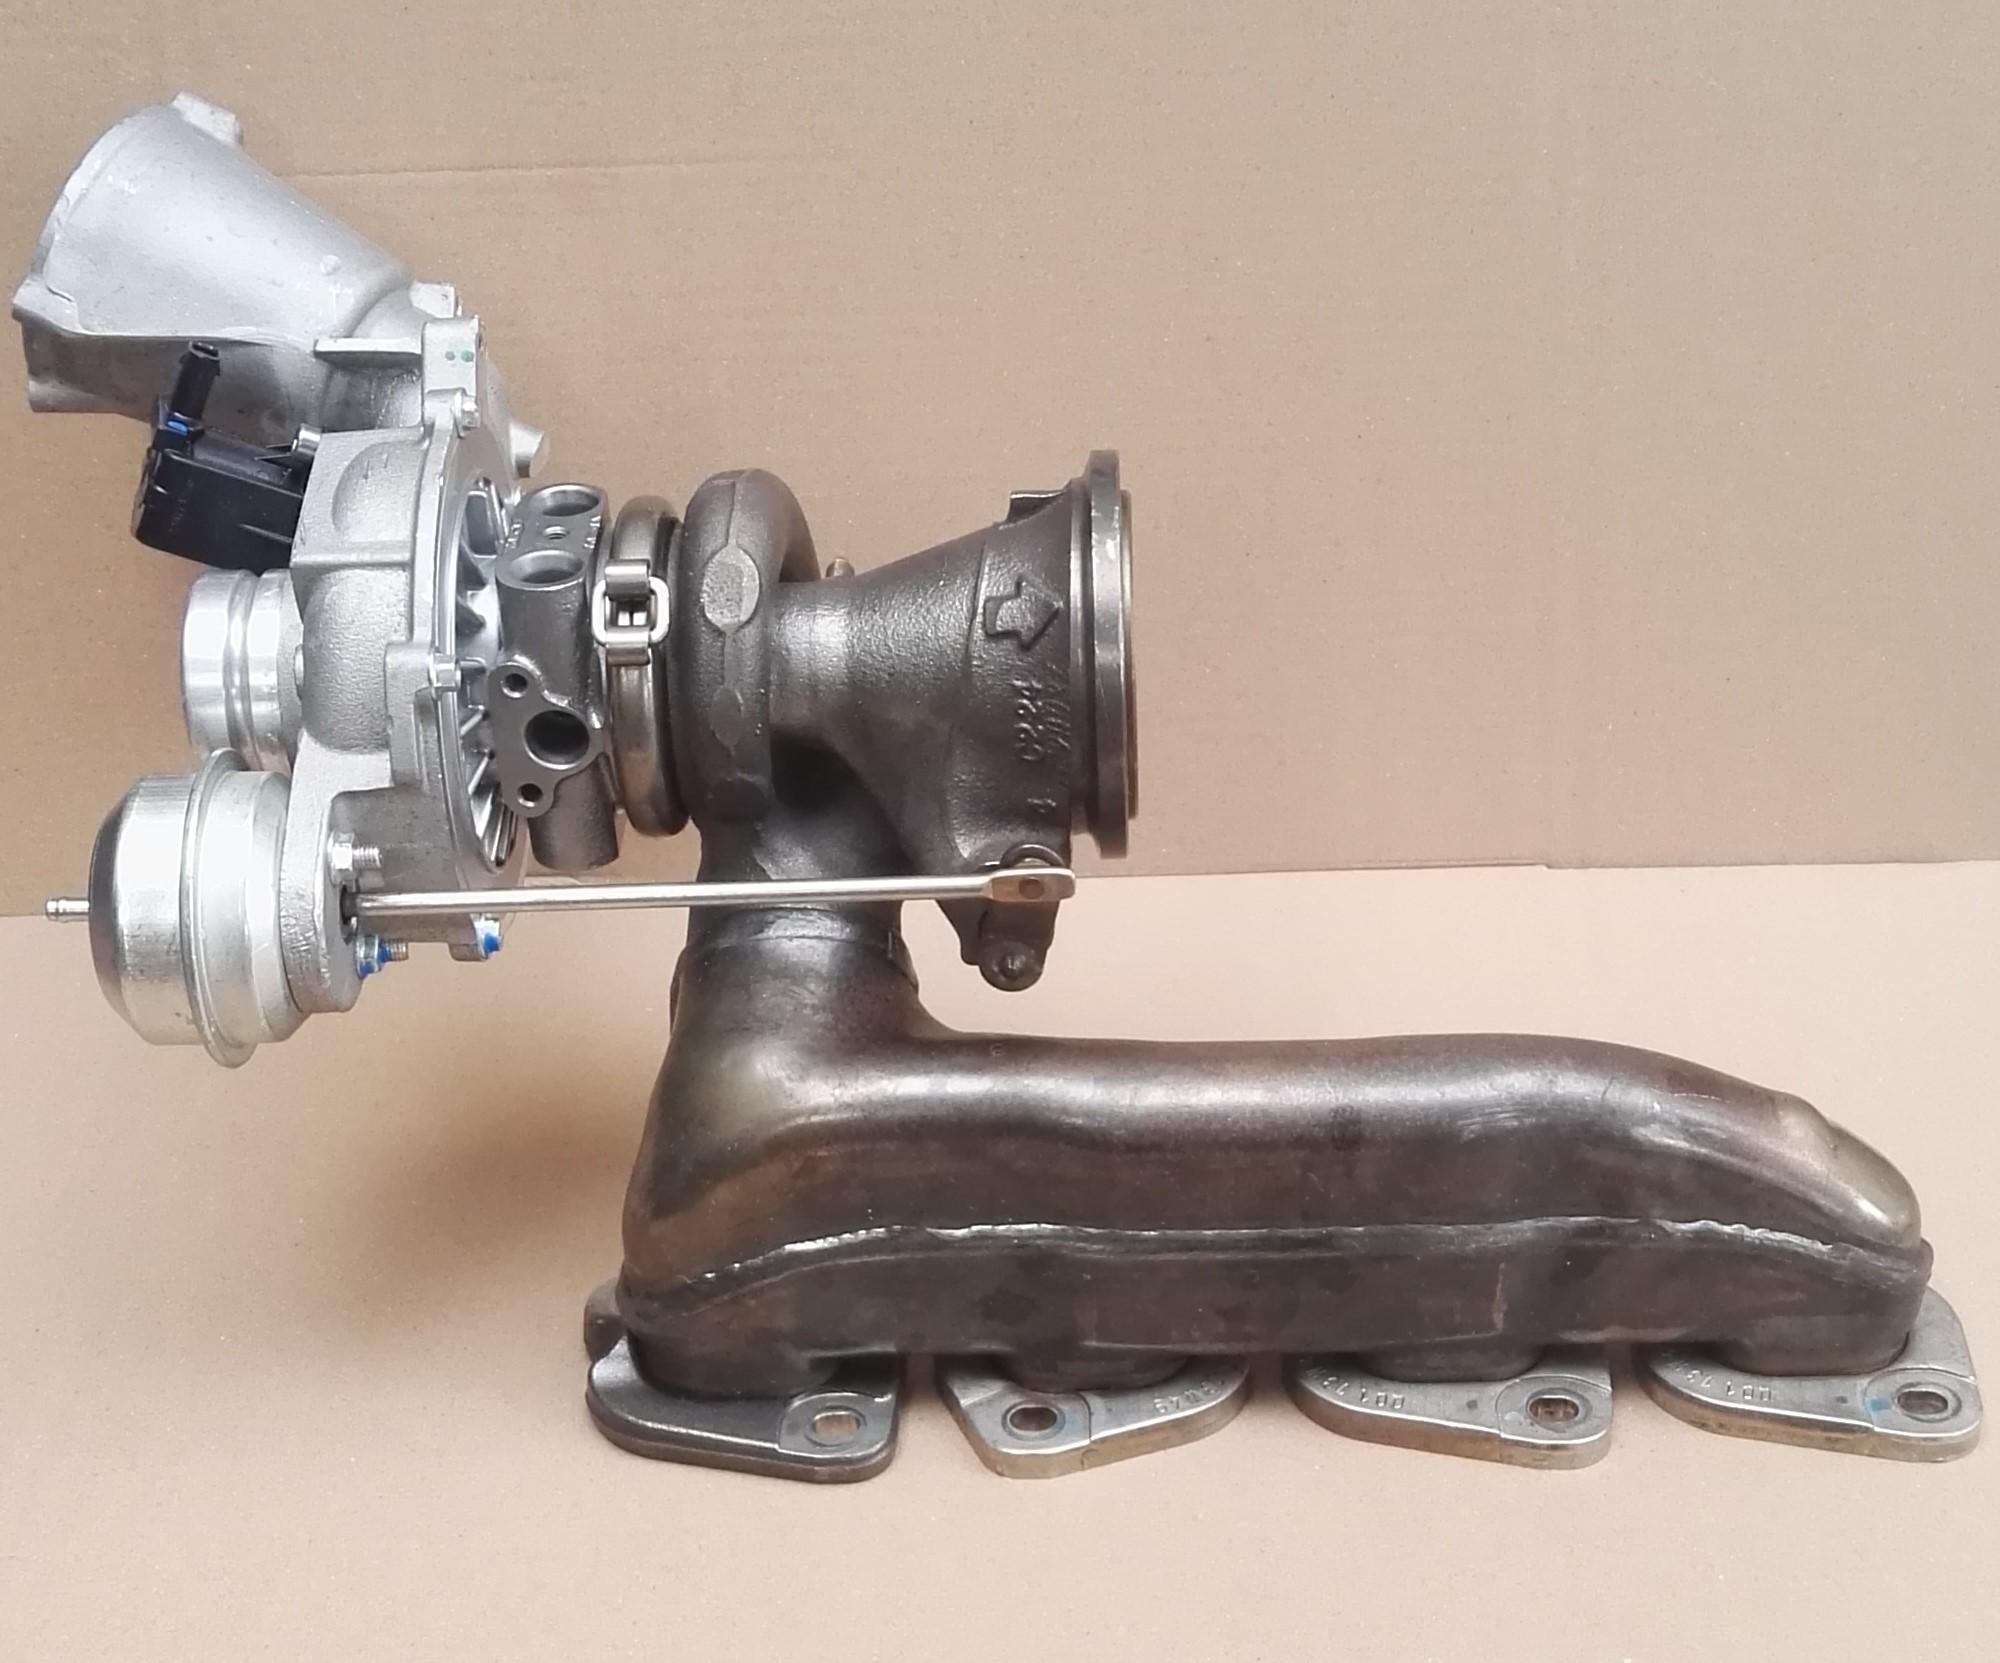 M271 M274 Turbo Upgrade Mercedes C300 W205 Hybrid Turbo Infiniti Q50